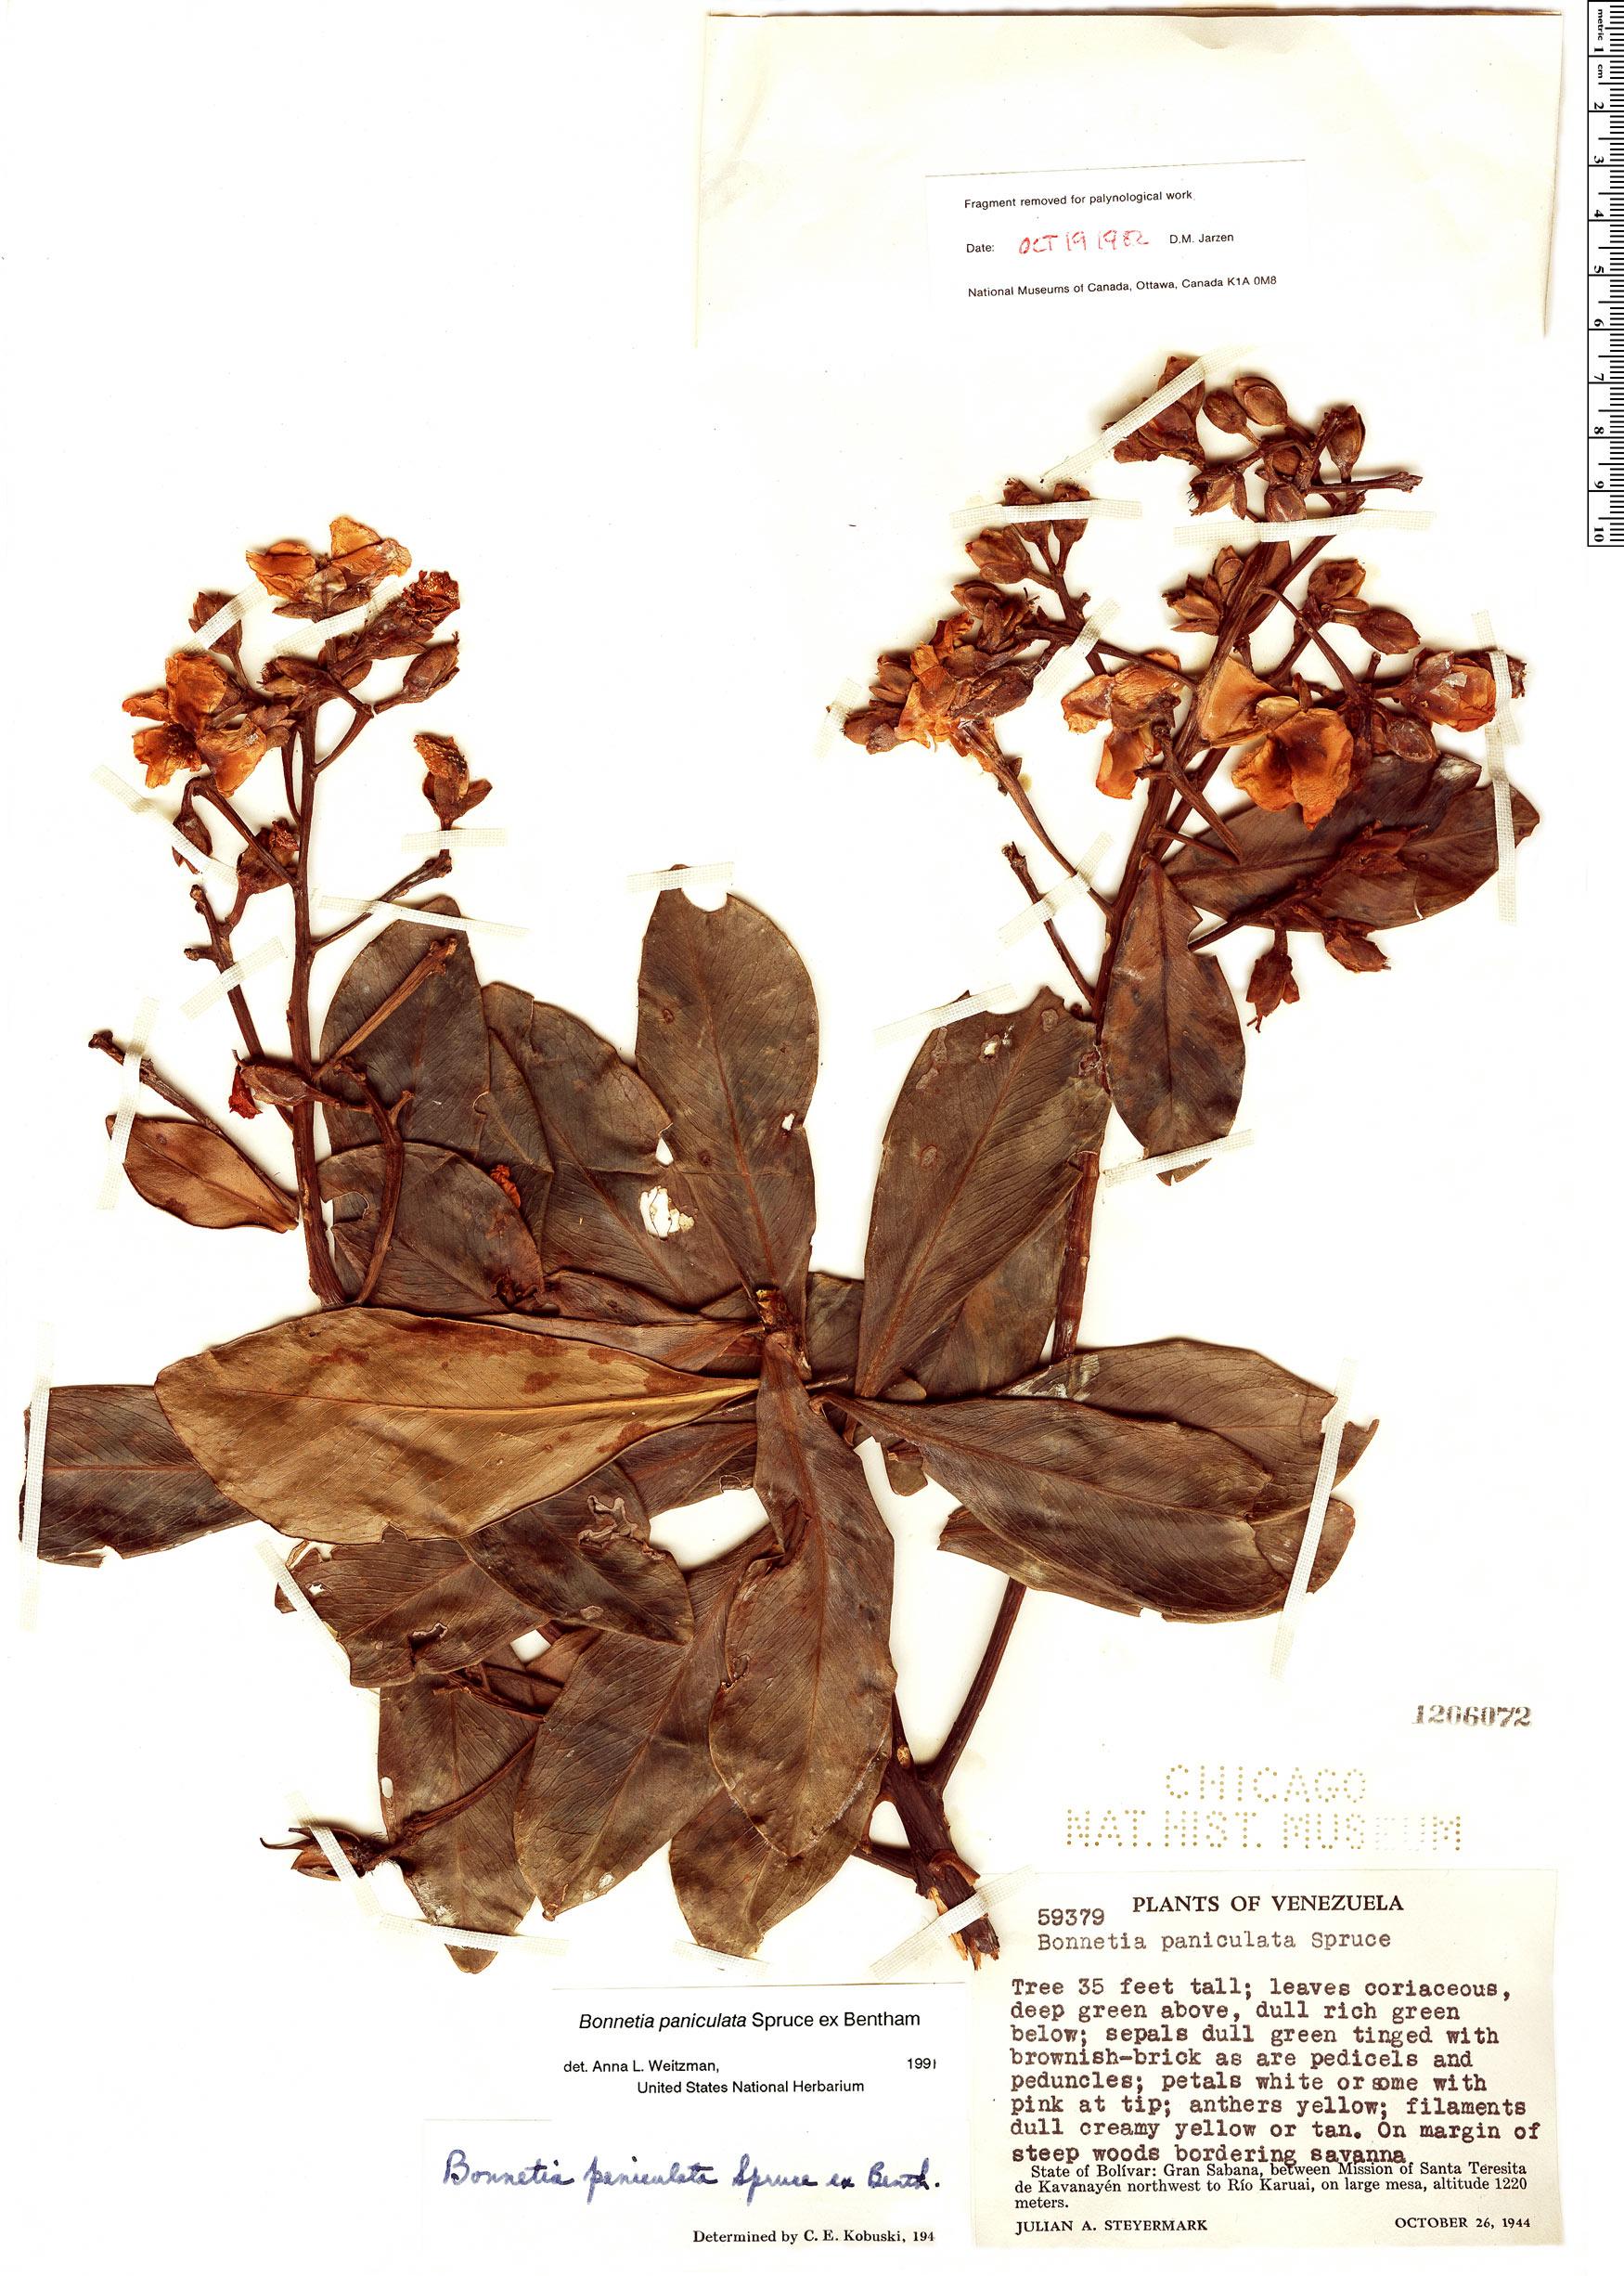 Specimen: Bonnetia paniculata